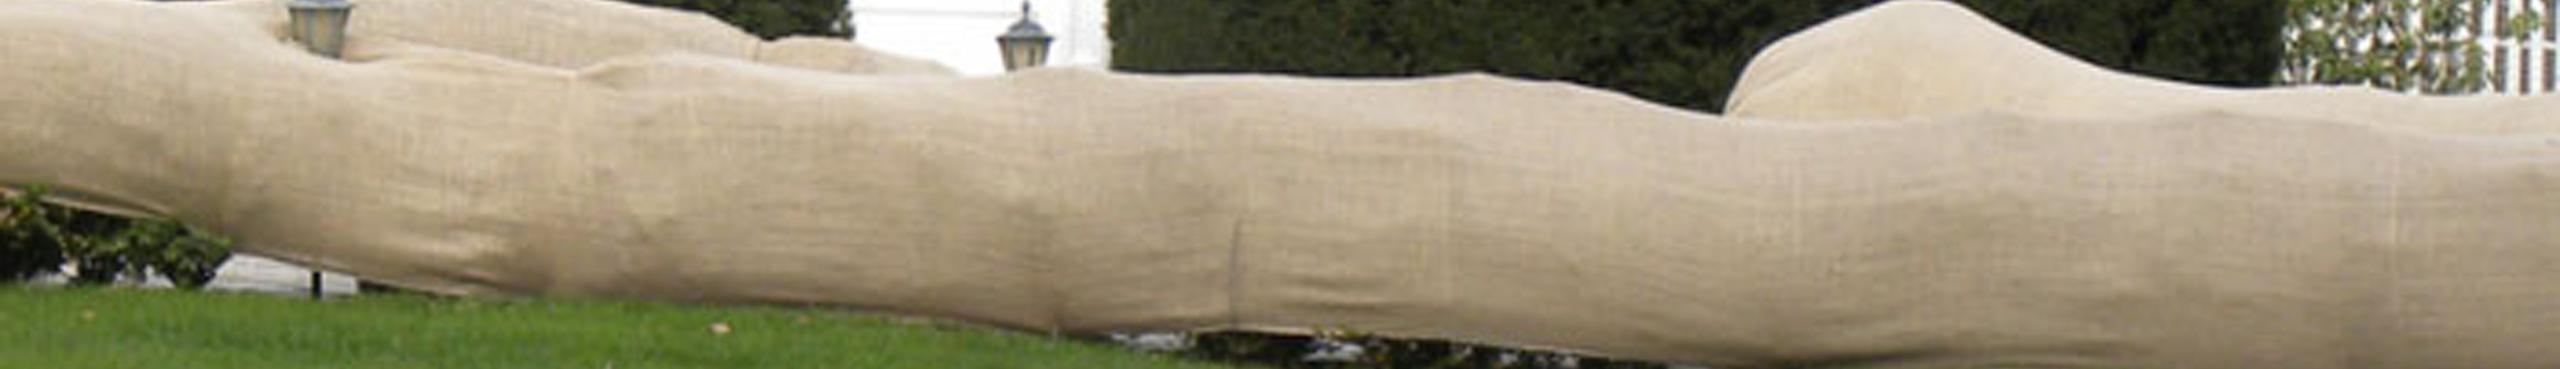 Daybag Burlap Windbreak Application